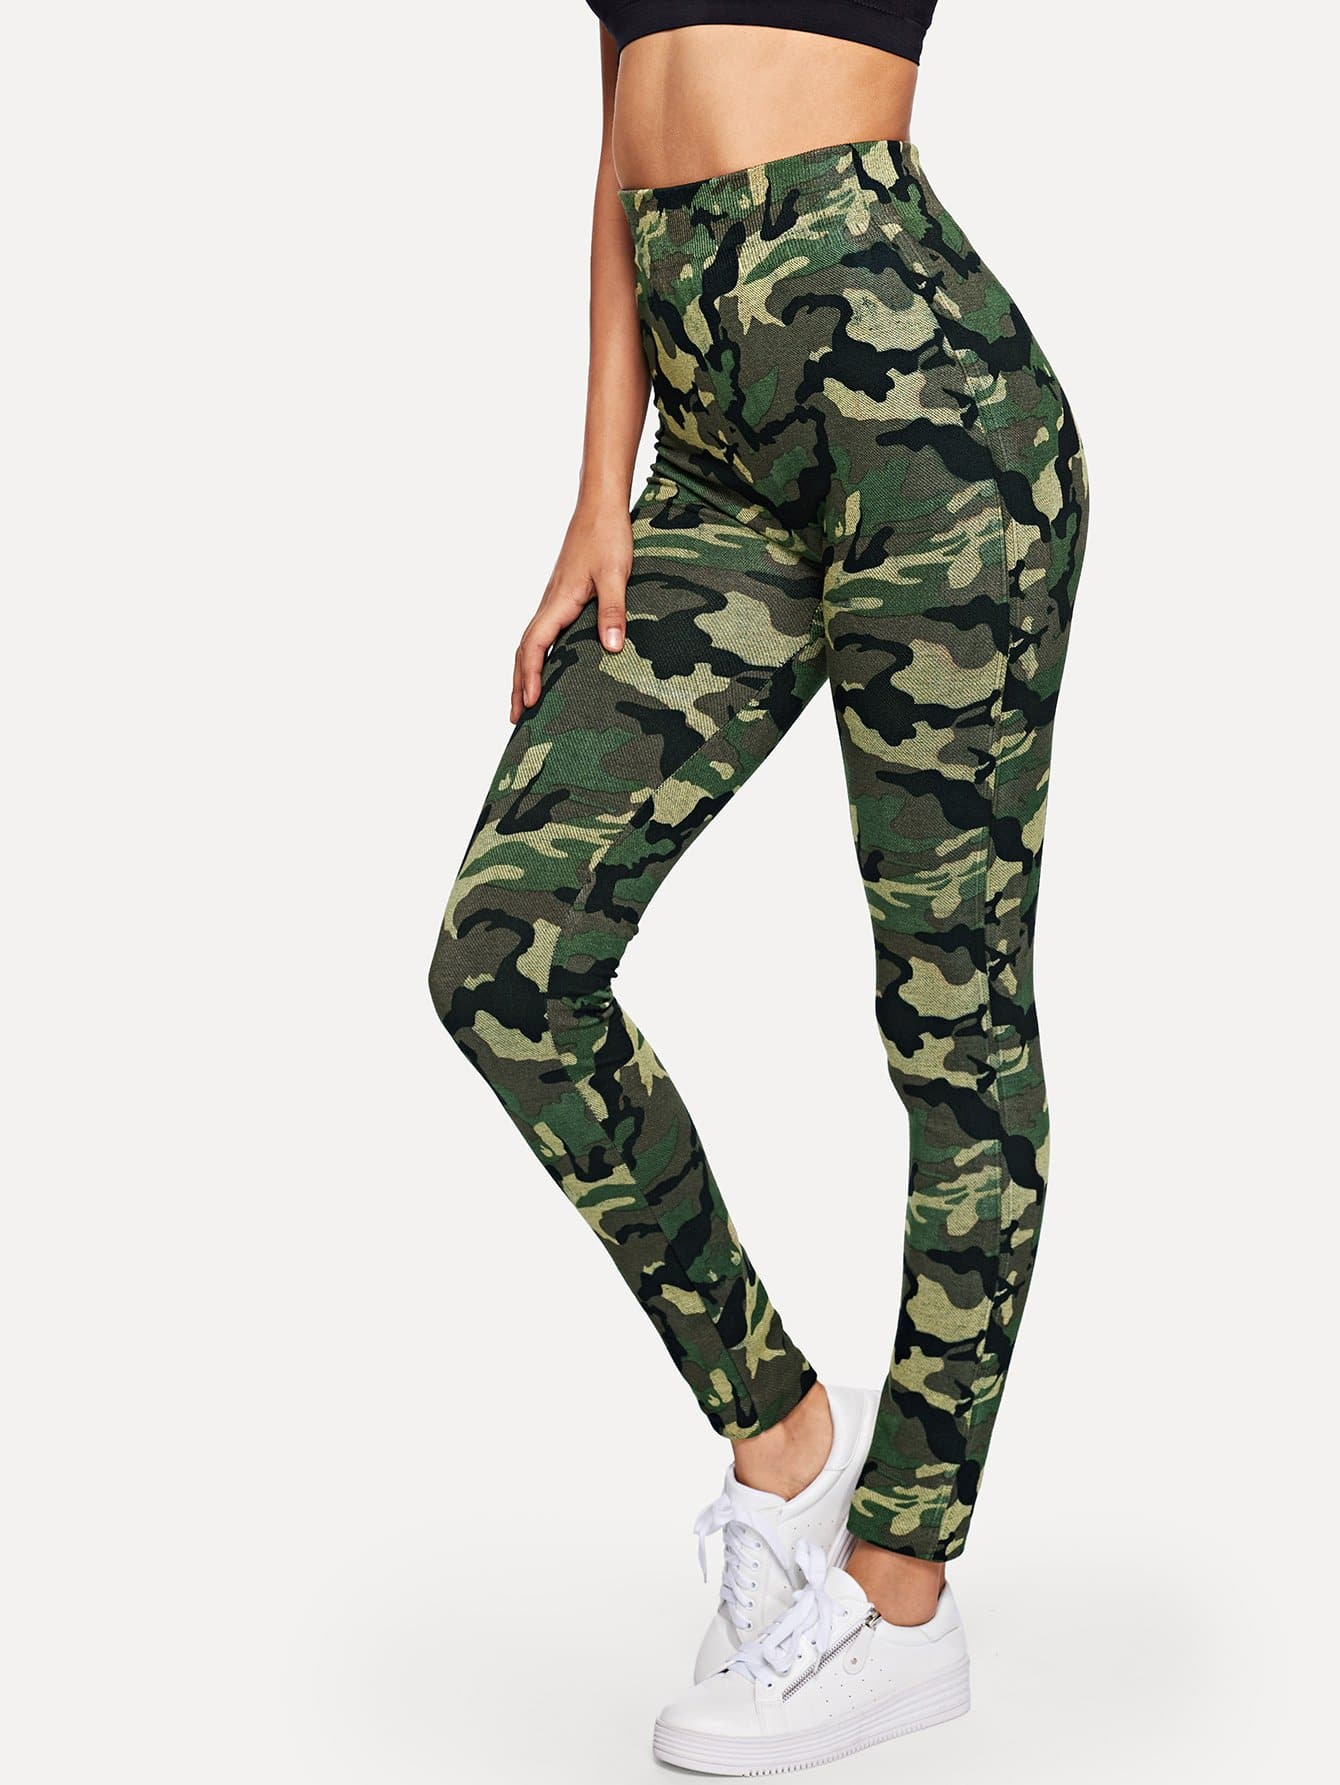 Wide Waist Camo Print Leggings wide waist camo print leggings